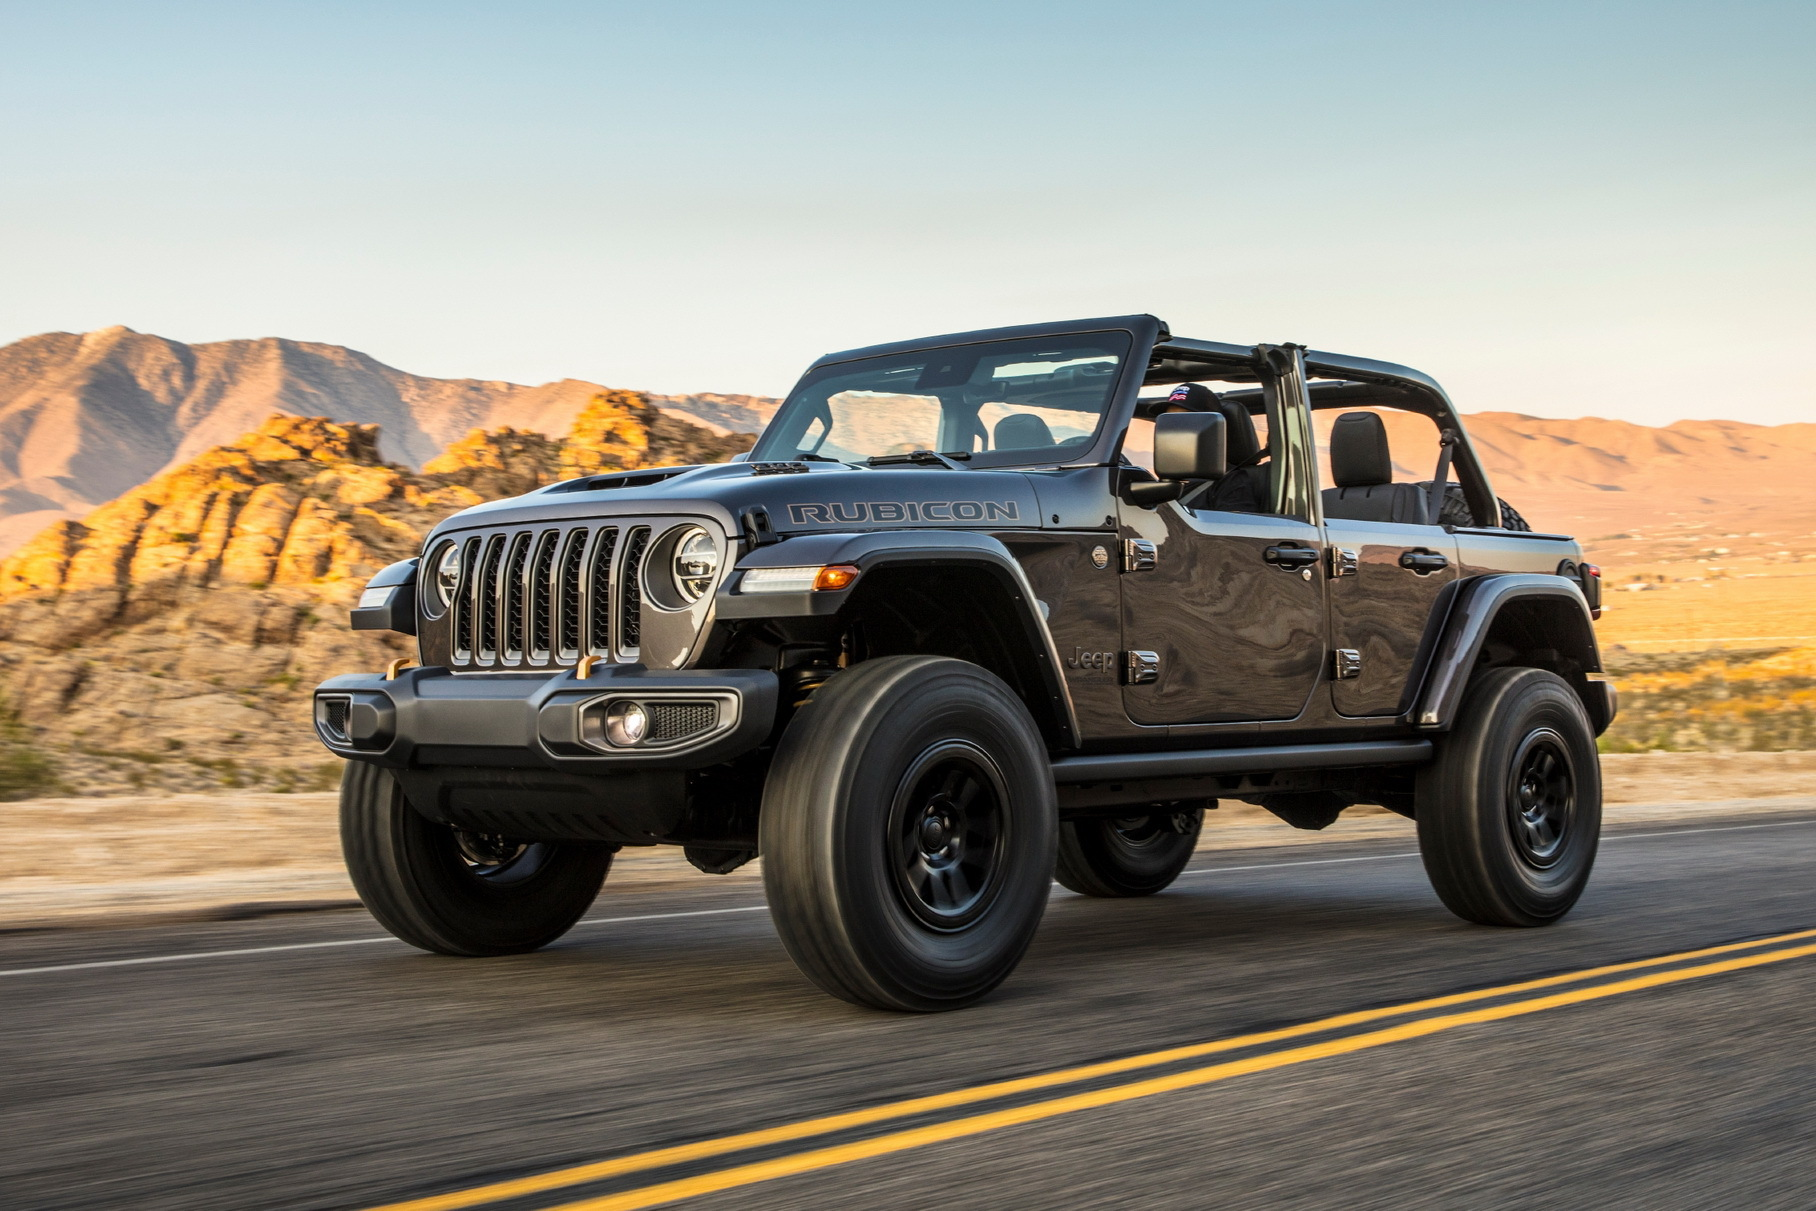 Jeep Wrangler V8 оказался прожорливее Lamborghini и McLaren